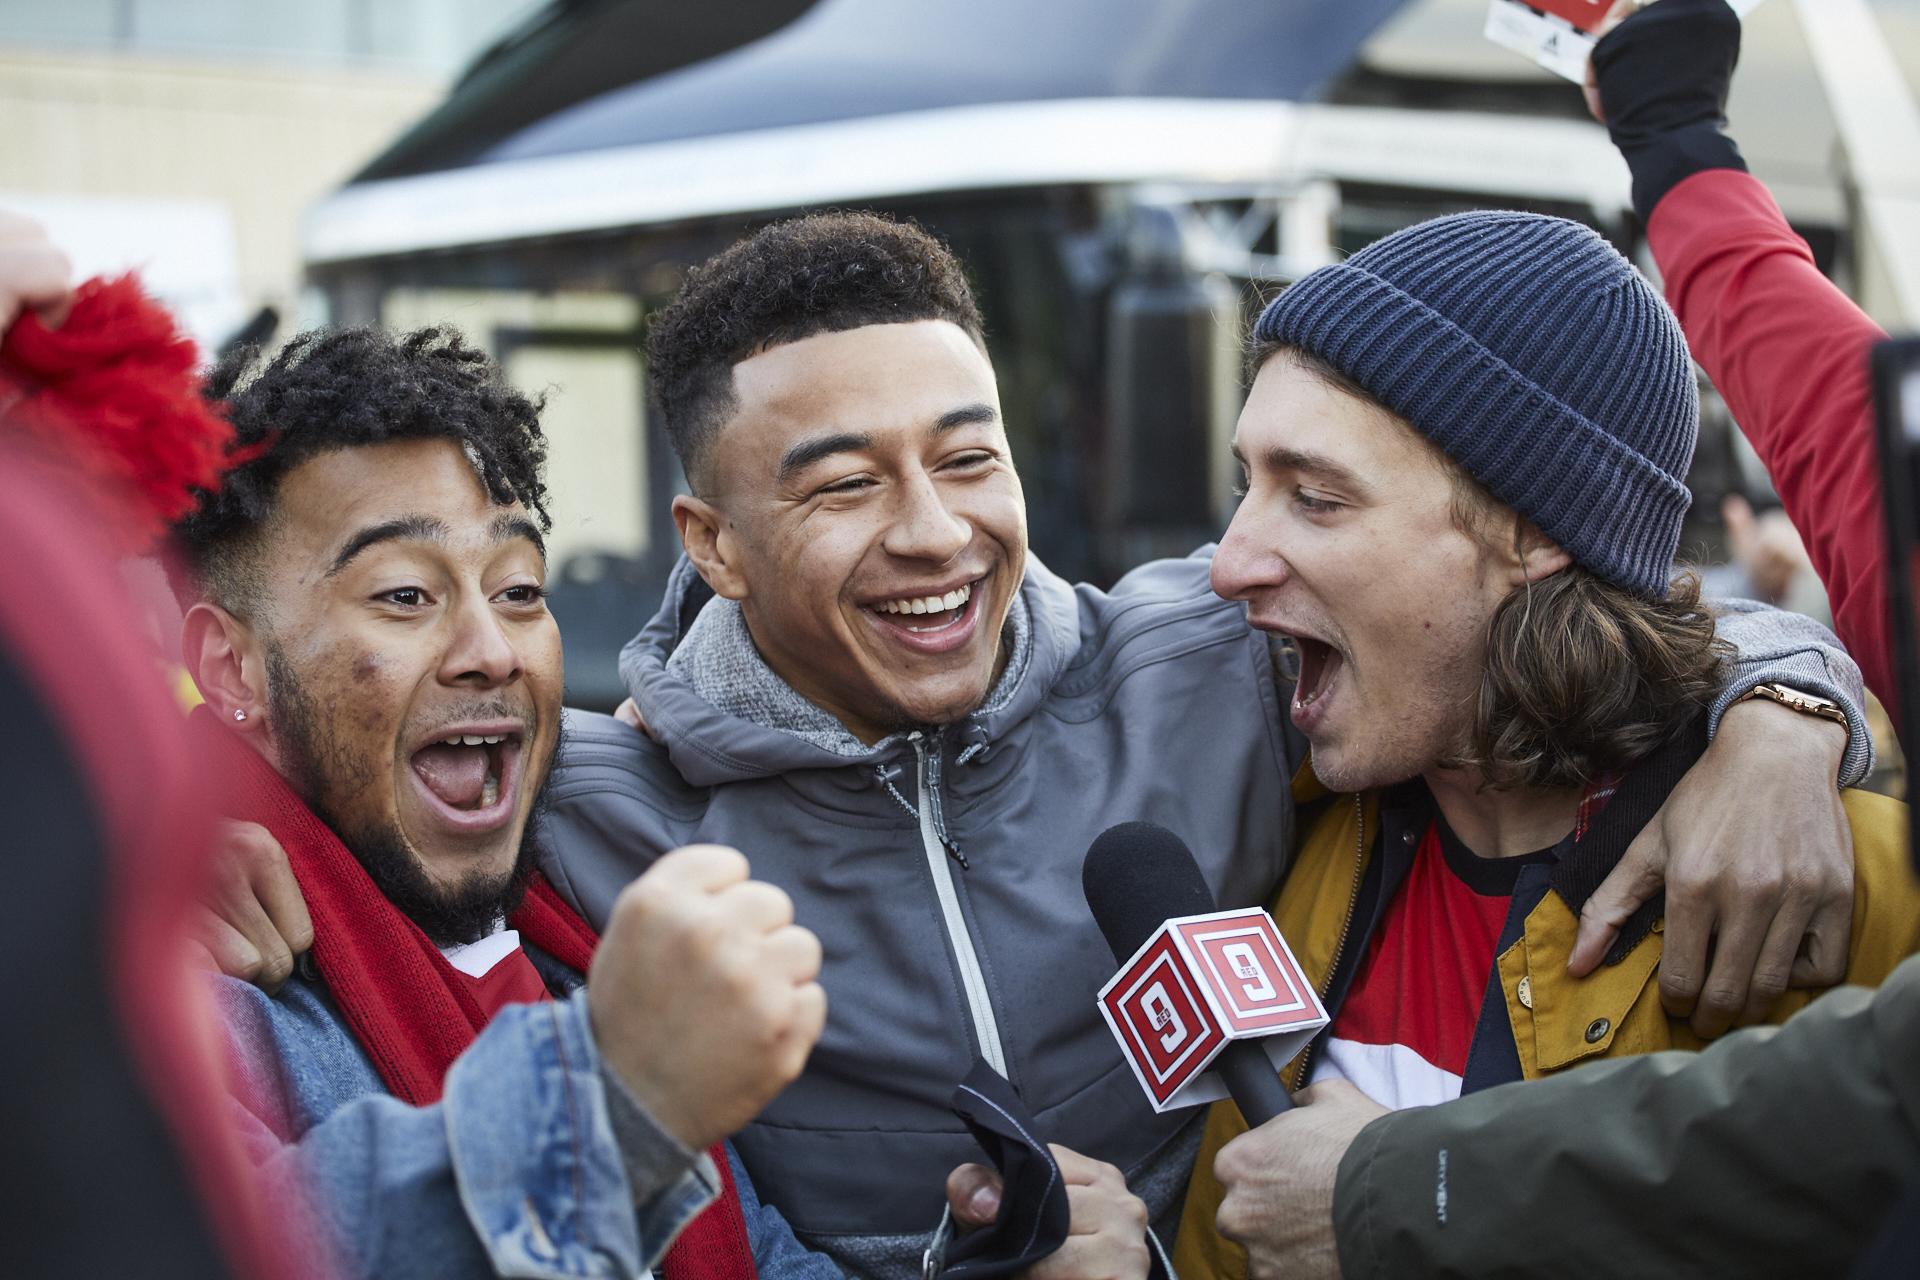 Coca-Cola/Premier League: Where Everyone Plays